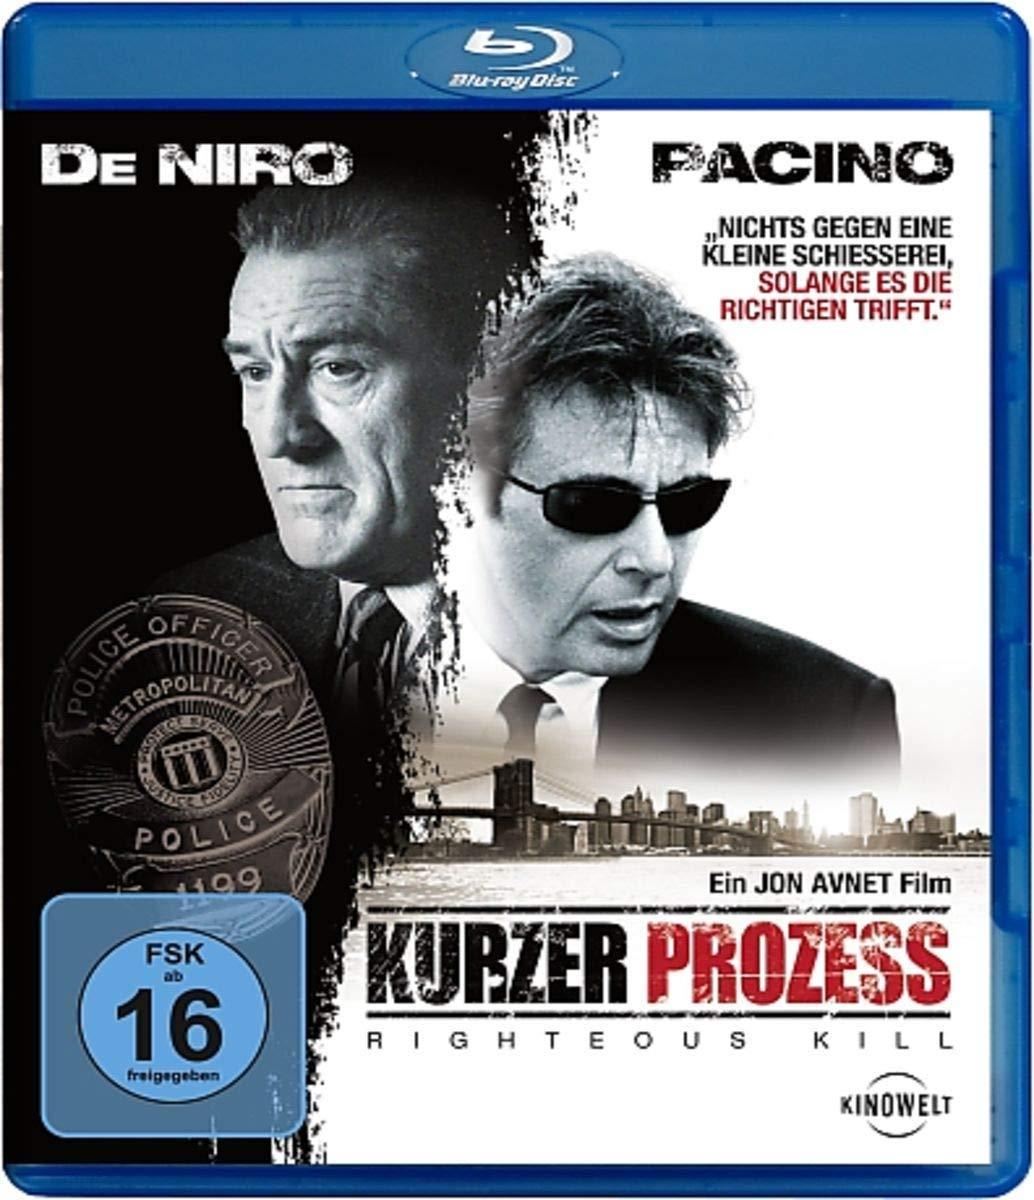 Kurzer Prozess - Righteous Kill (Blu-ray) für 3,88€ (Amazon Prime & Dodax)